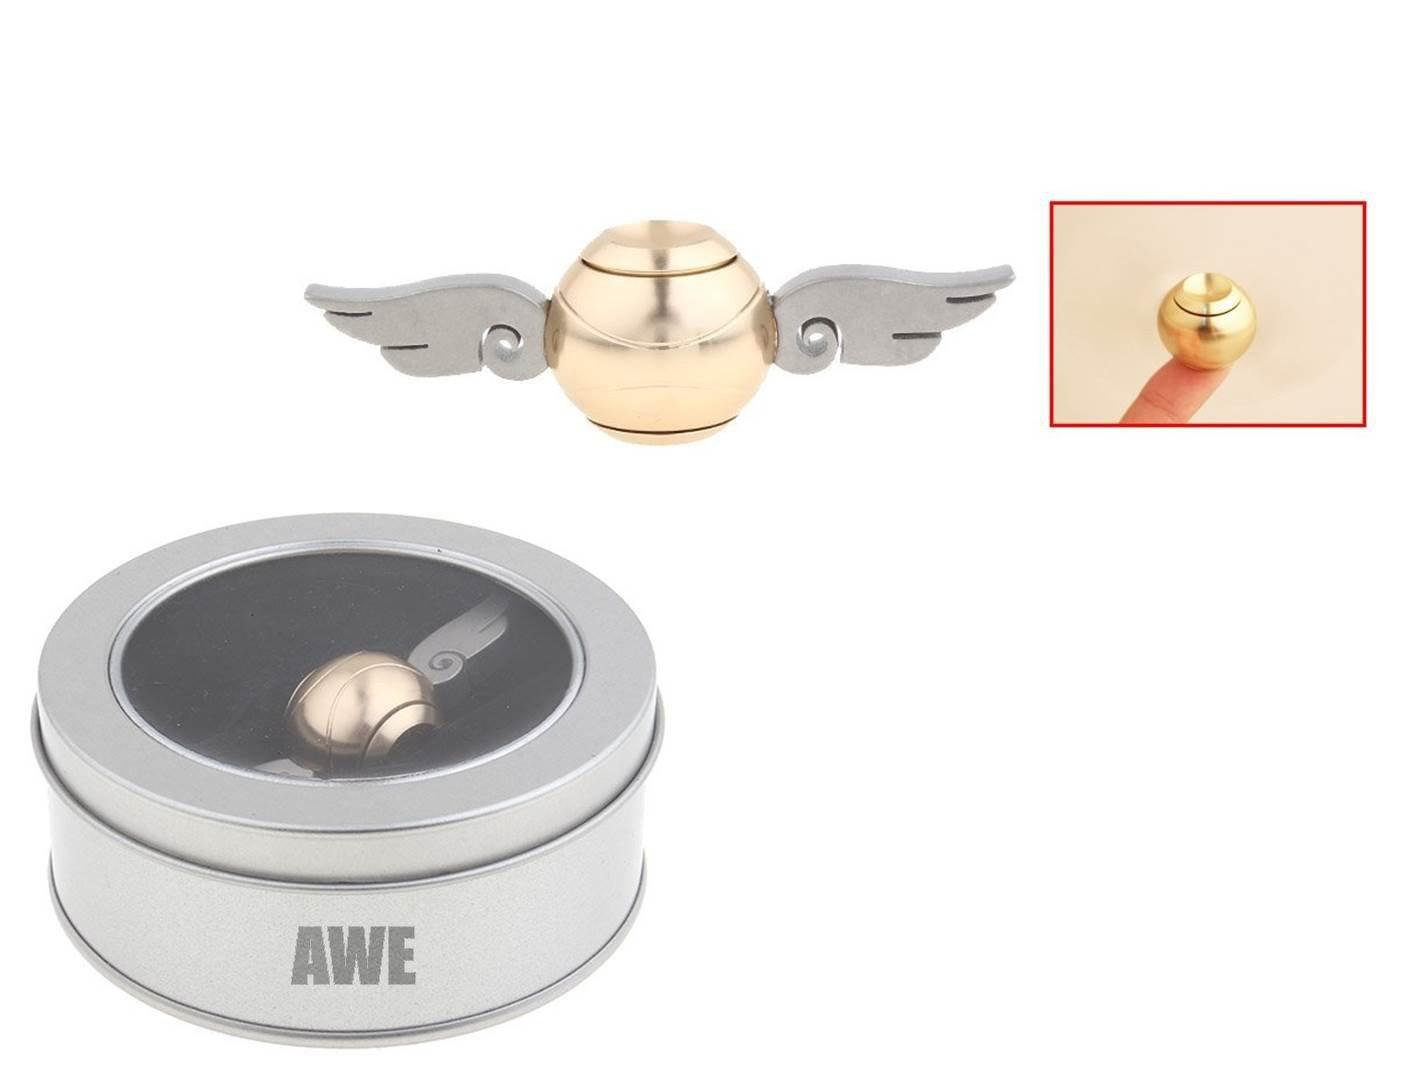 M.T.A Premium Golden Snitch Fidget Spinner Hand Fidget Spinner Focus Toy Aluminum + Stainless Steel +Box for a Gift